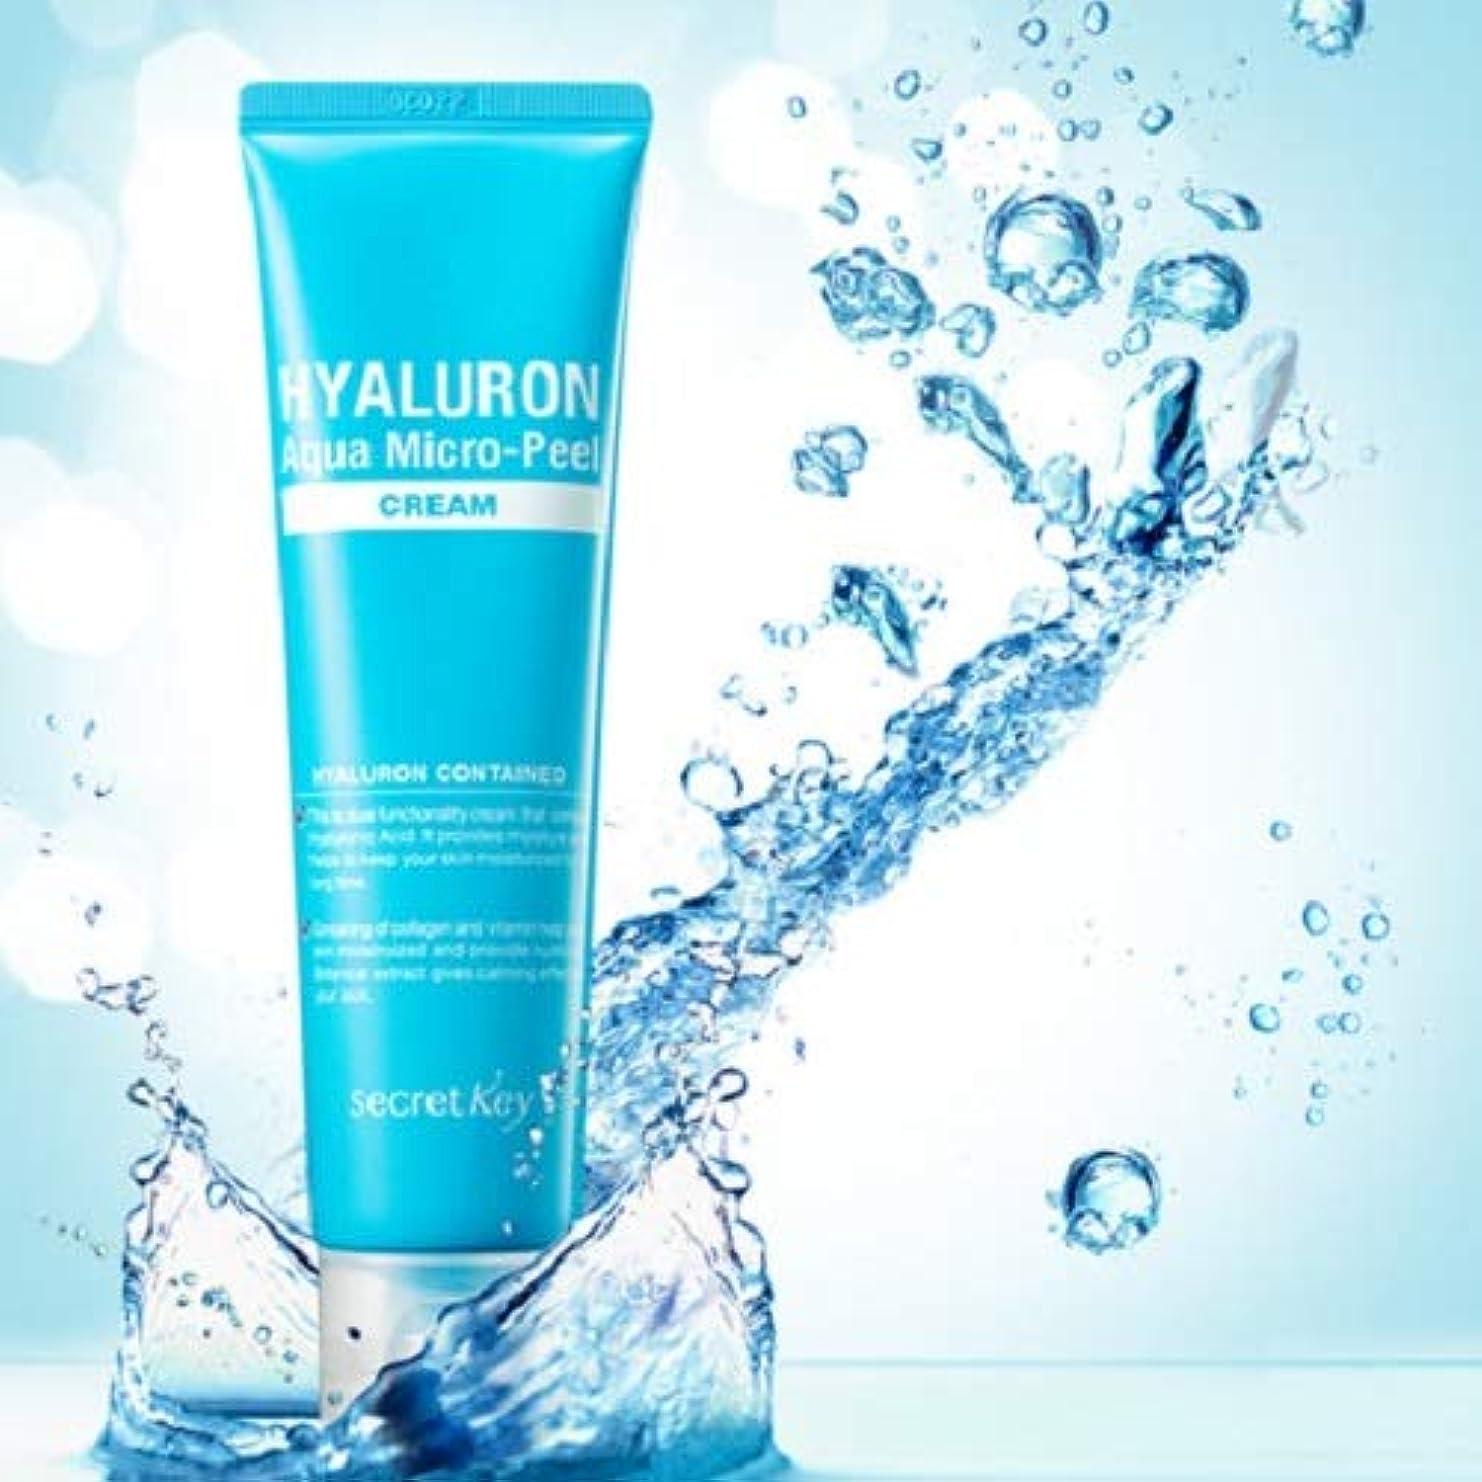 調和特異性養うSecret Key Hyaluron Aqua Micro Peel Cream 70g/Deep Moisturizing Cream/Korea cosmetics [並行輸入品]